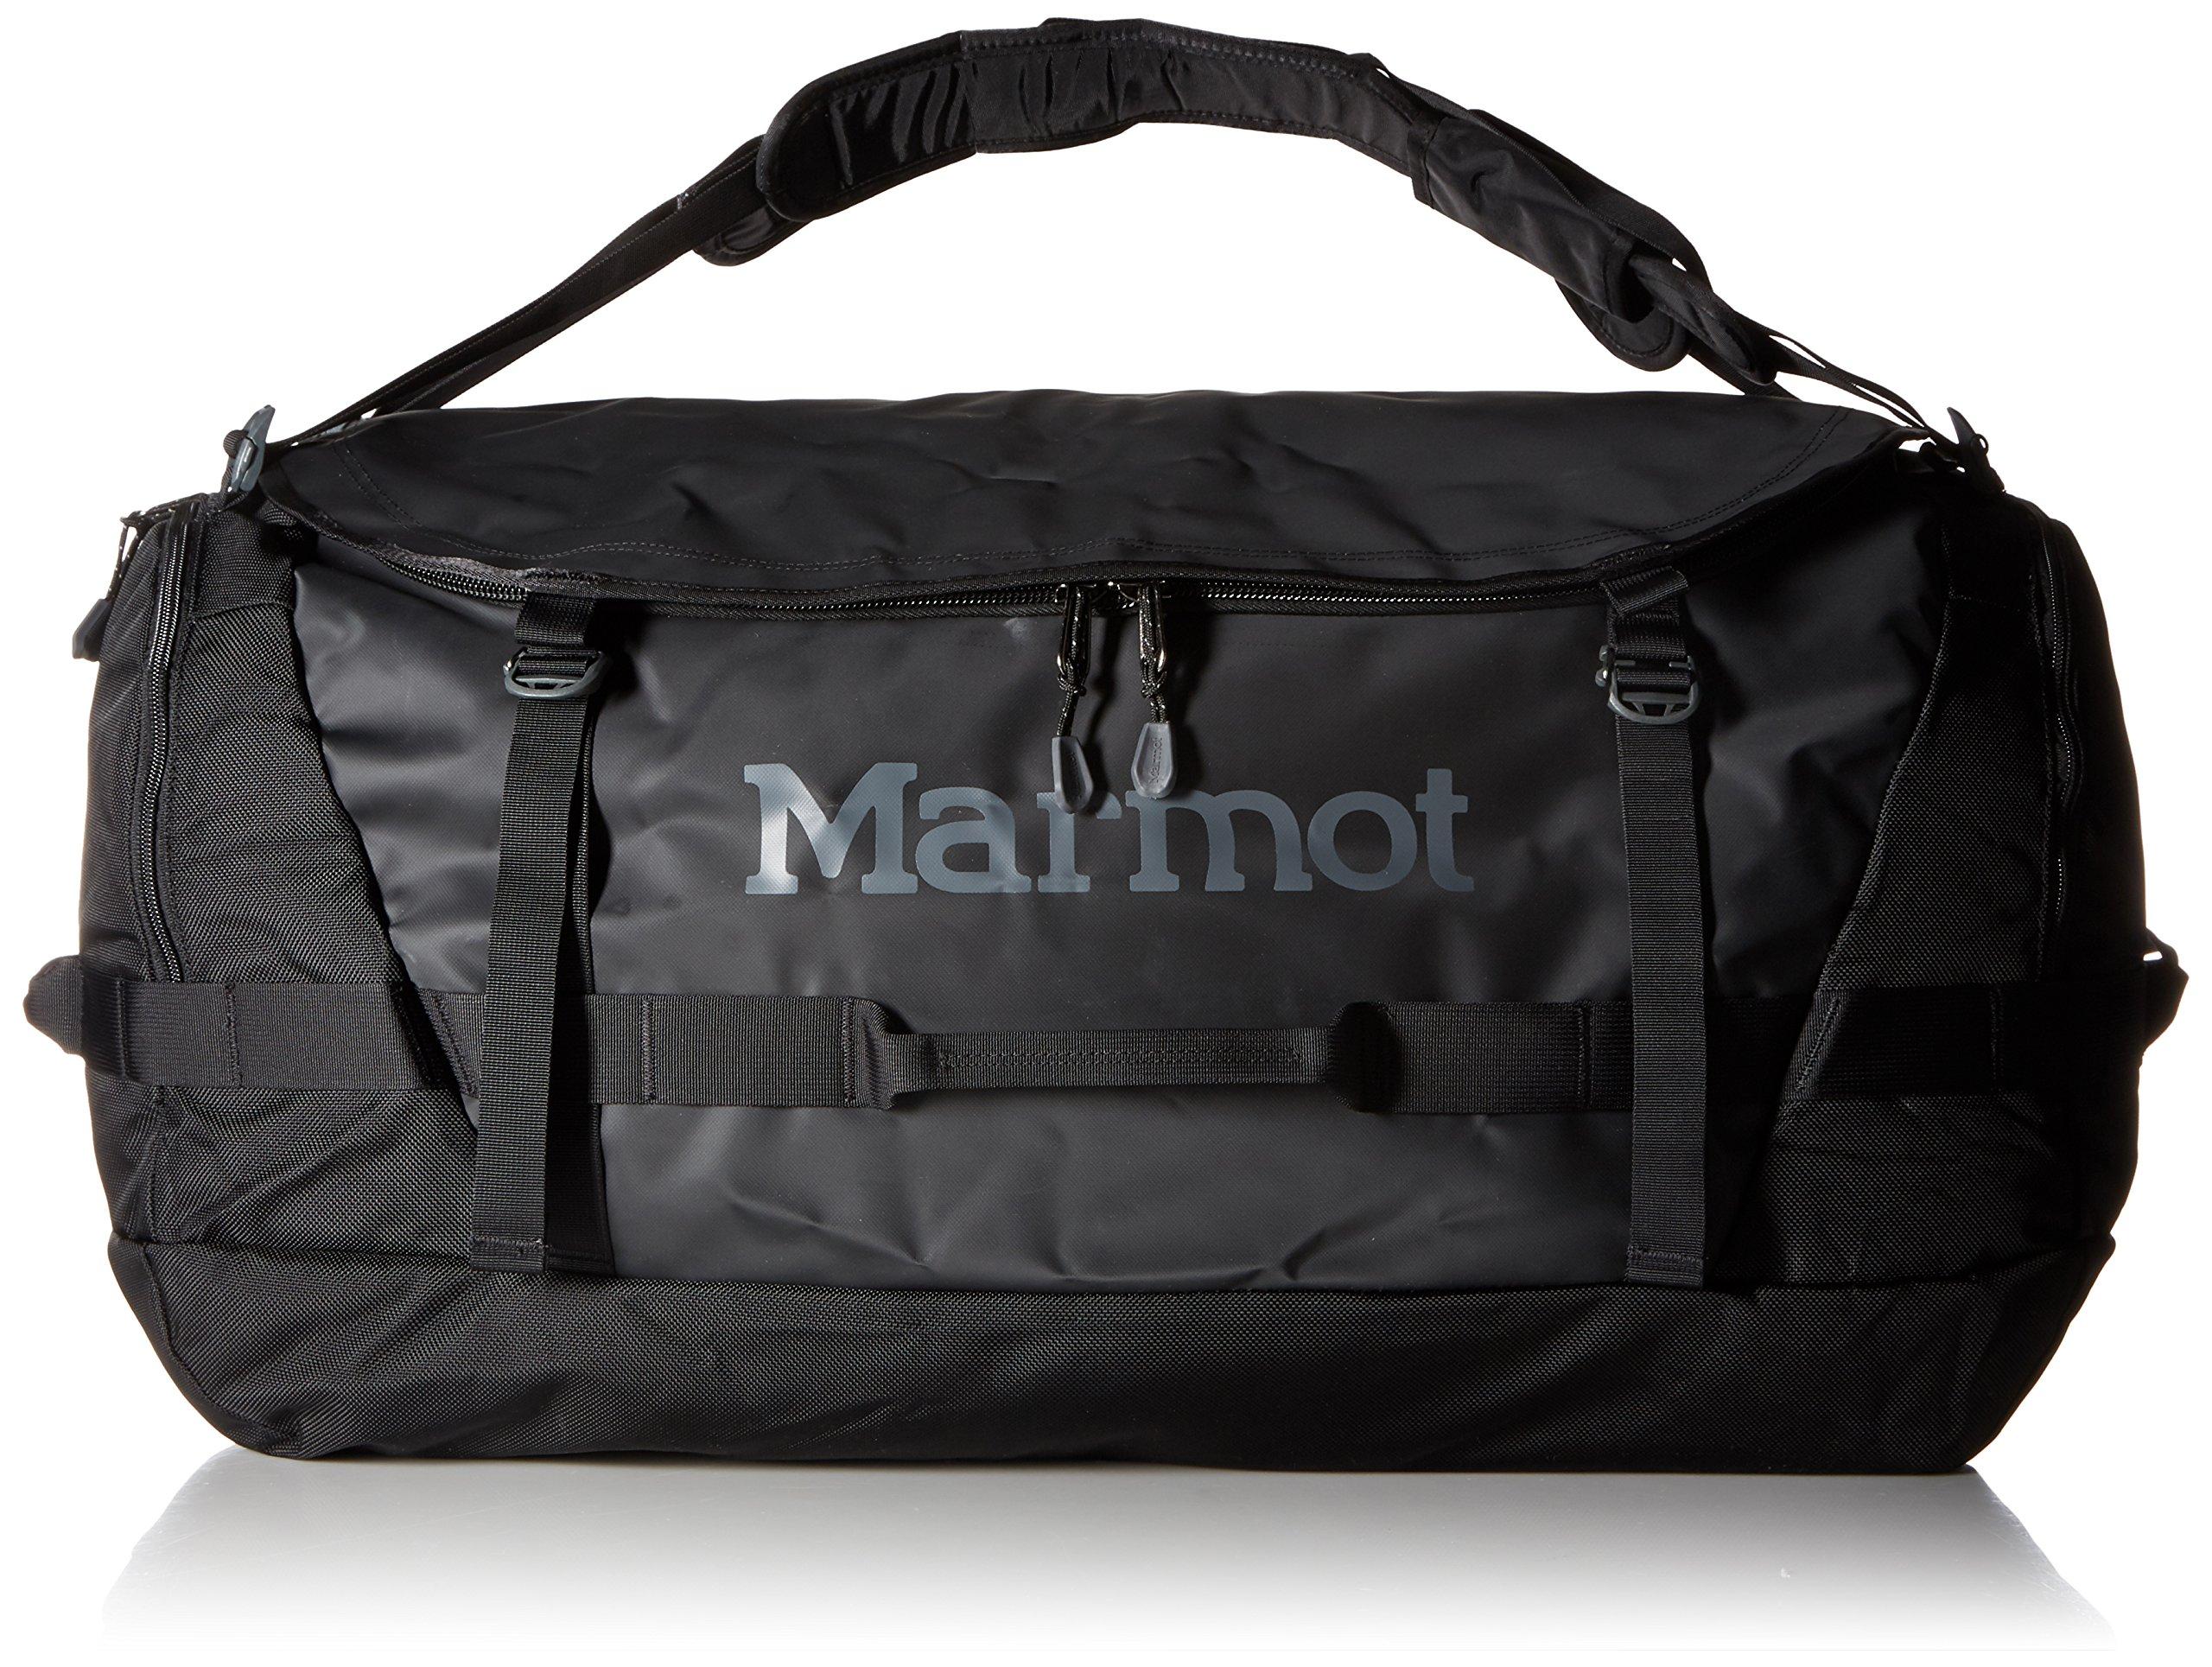 Marmot Long Hauler Extra-Large Travel Duffel Bag, 6700ci (105 liter)